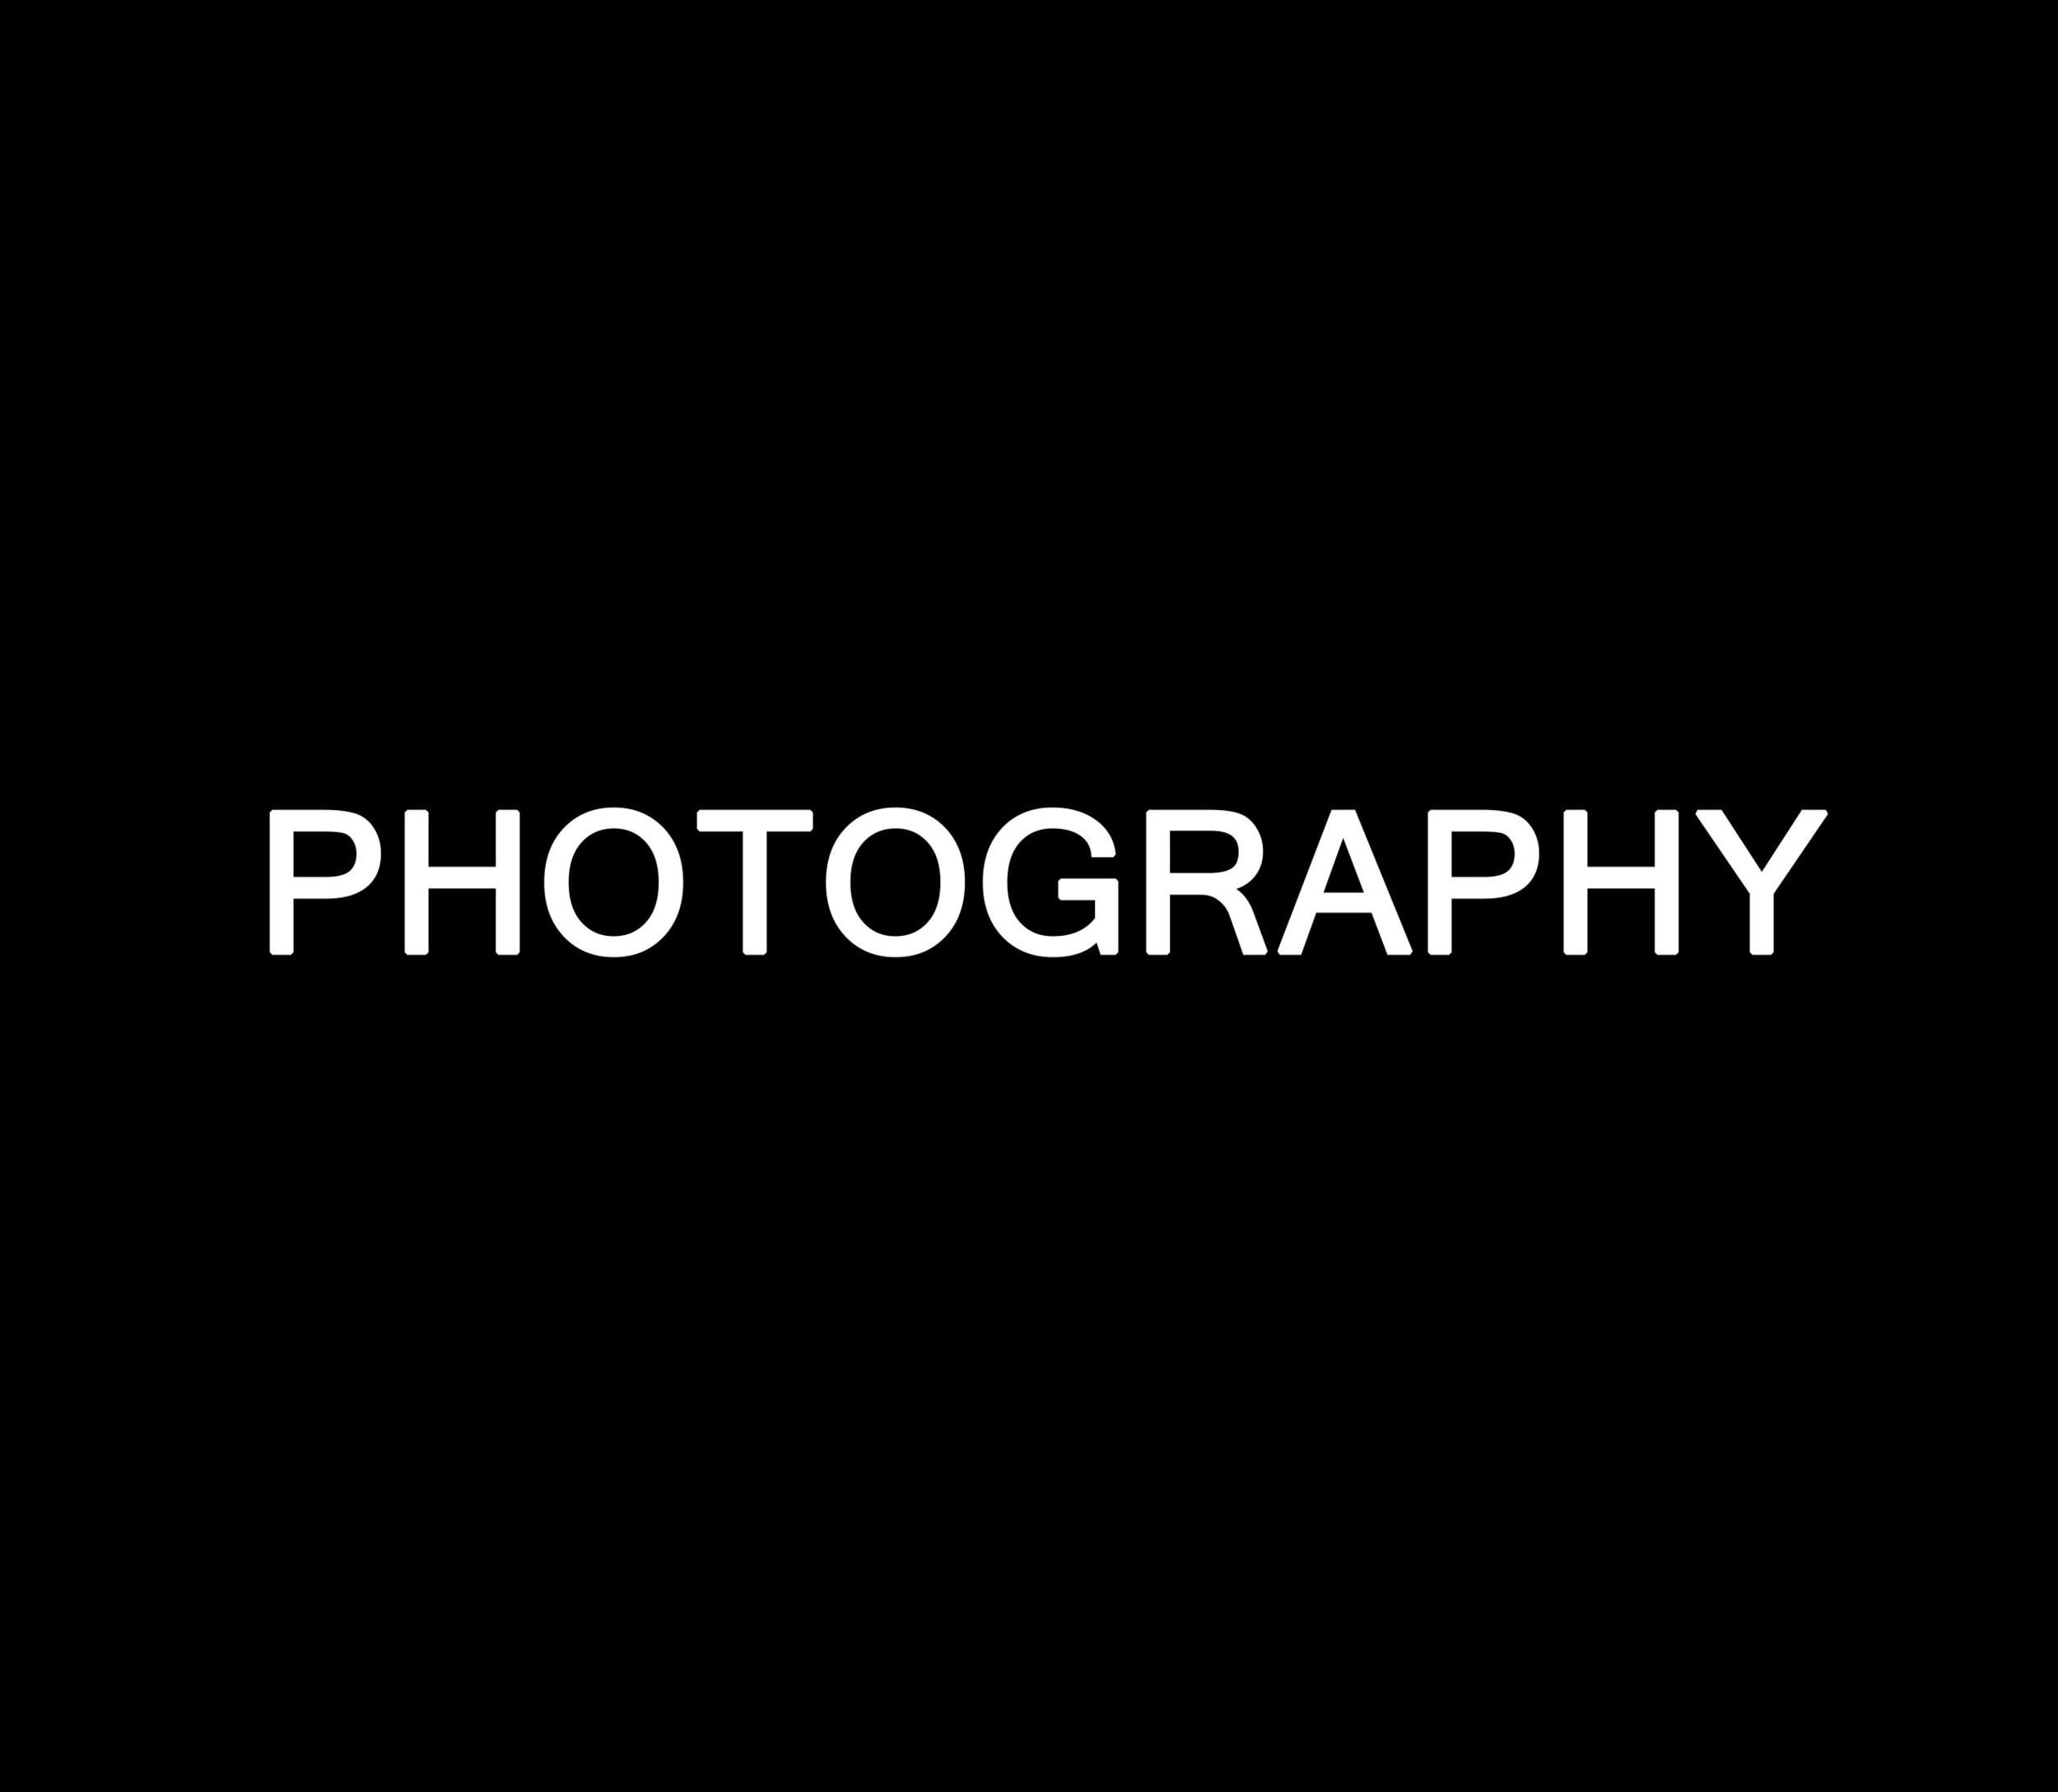 IMG_2516_Photography_1.jpg